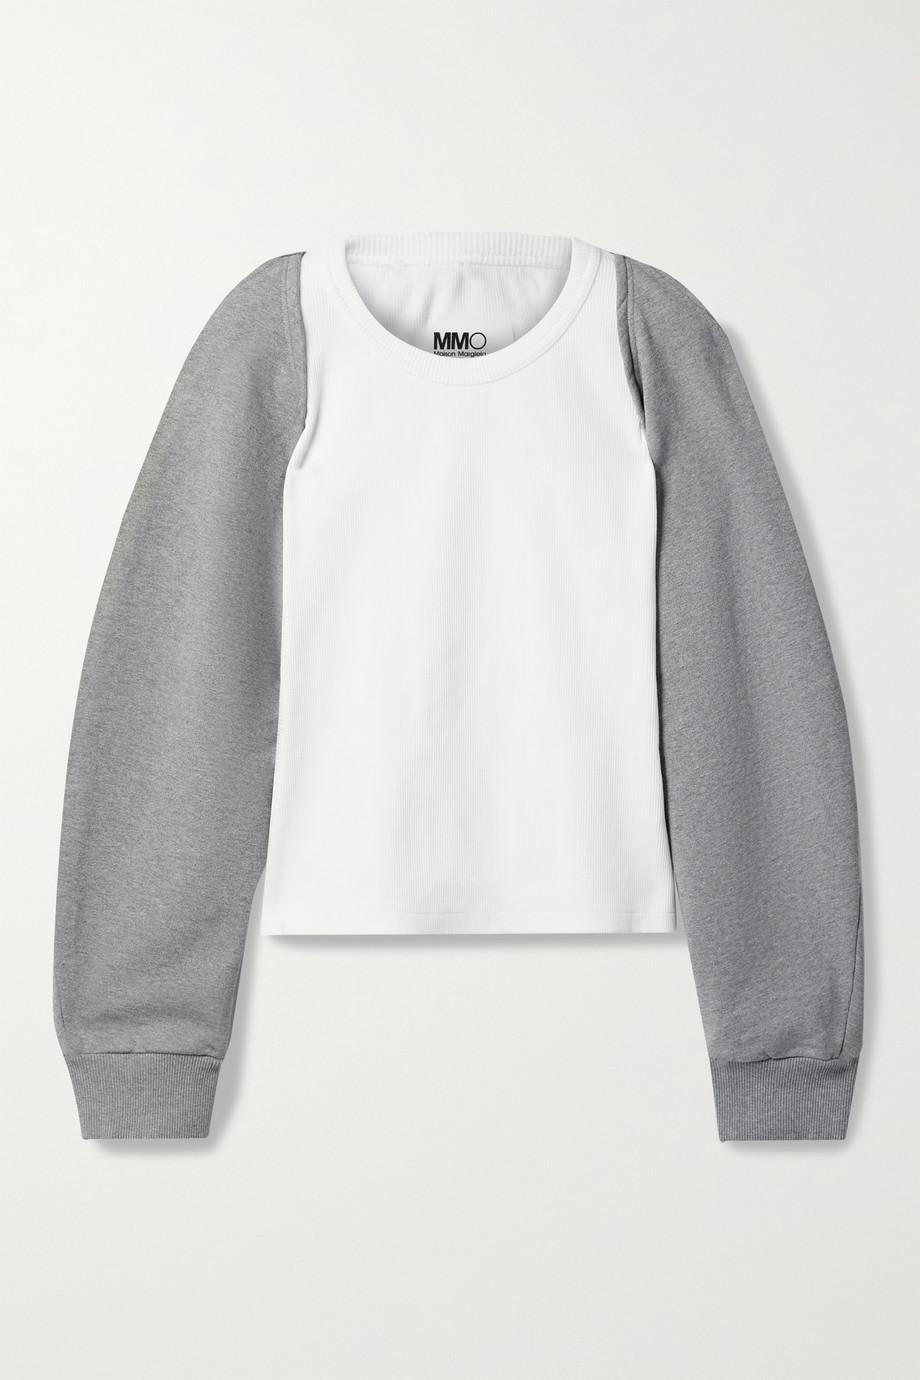 MM6 Maison Margiela Convertible cotton-blend sweatshirt